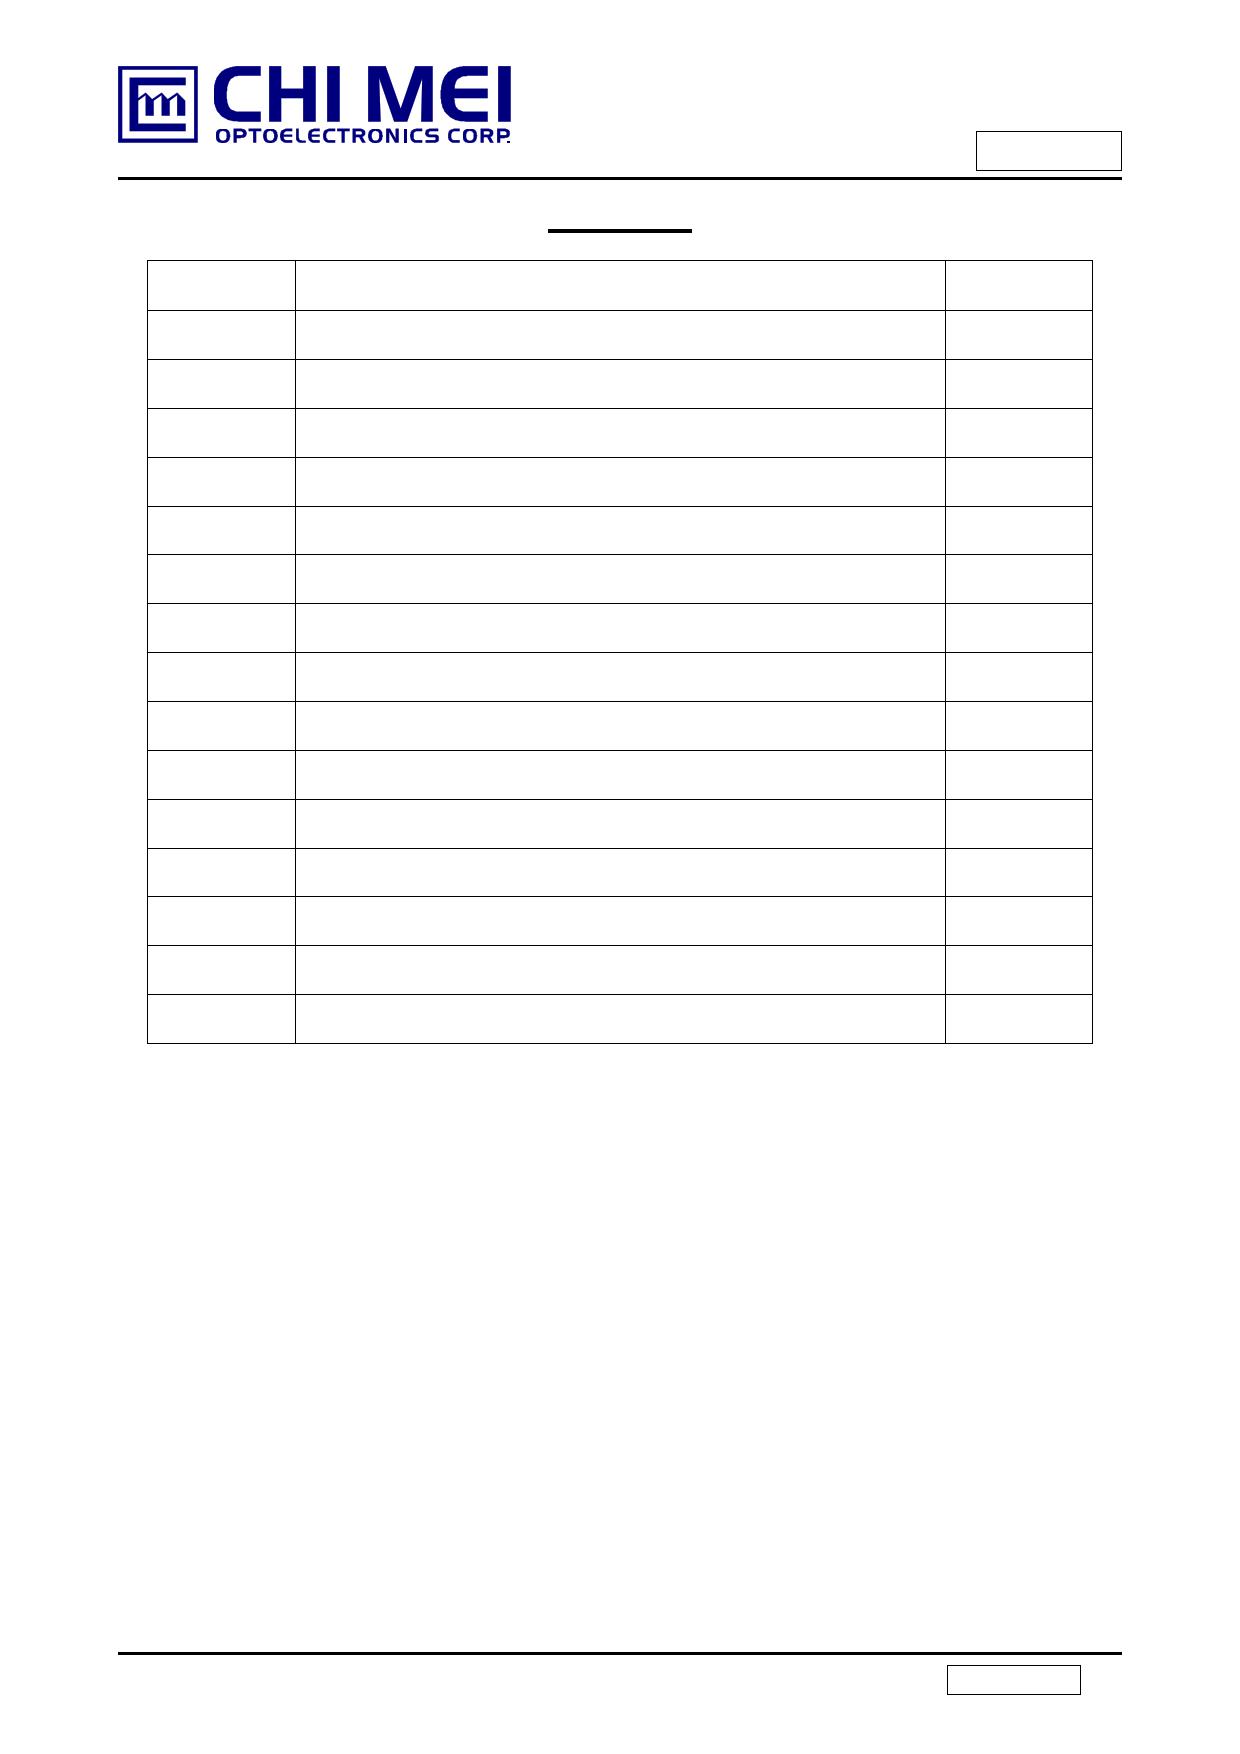 Q05002-601 pdf, schematic